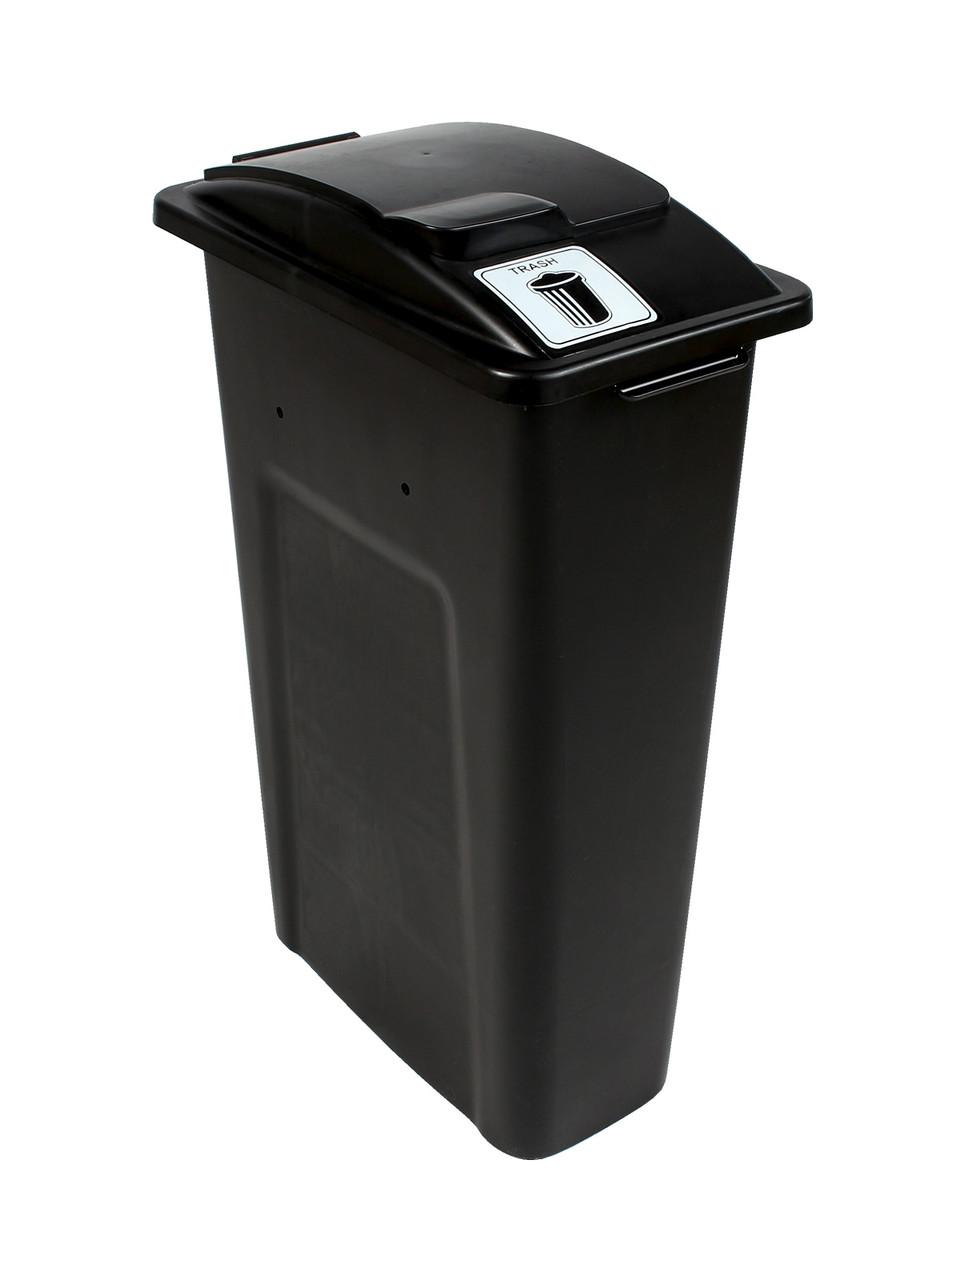 23 Gallon Black Skinny Simple Sort Trash Can (Trash, Lift Top)